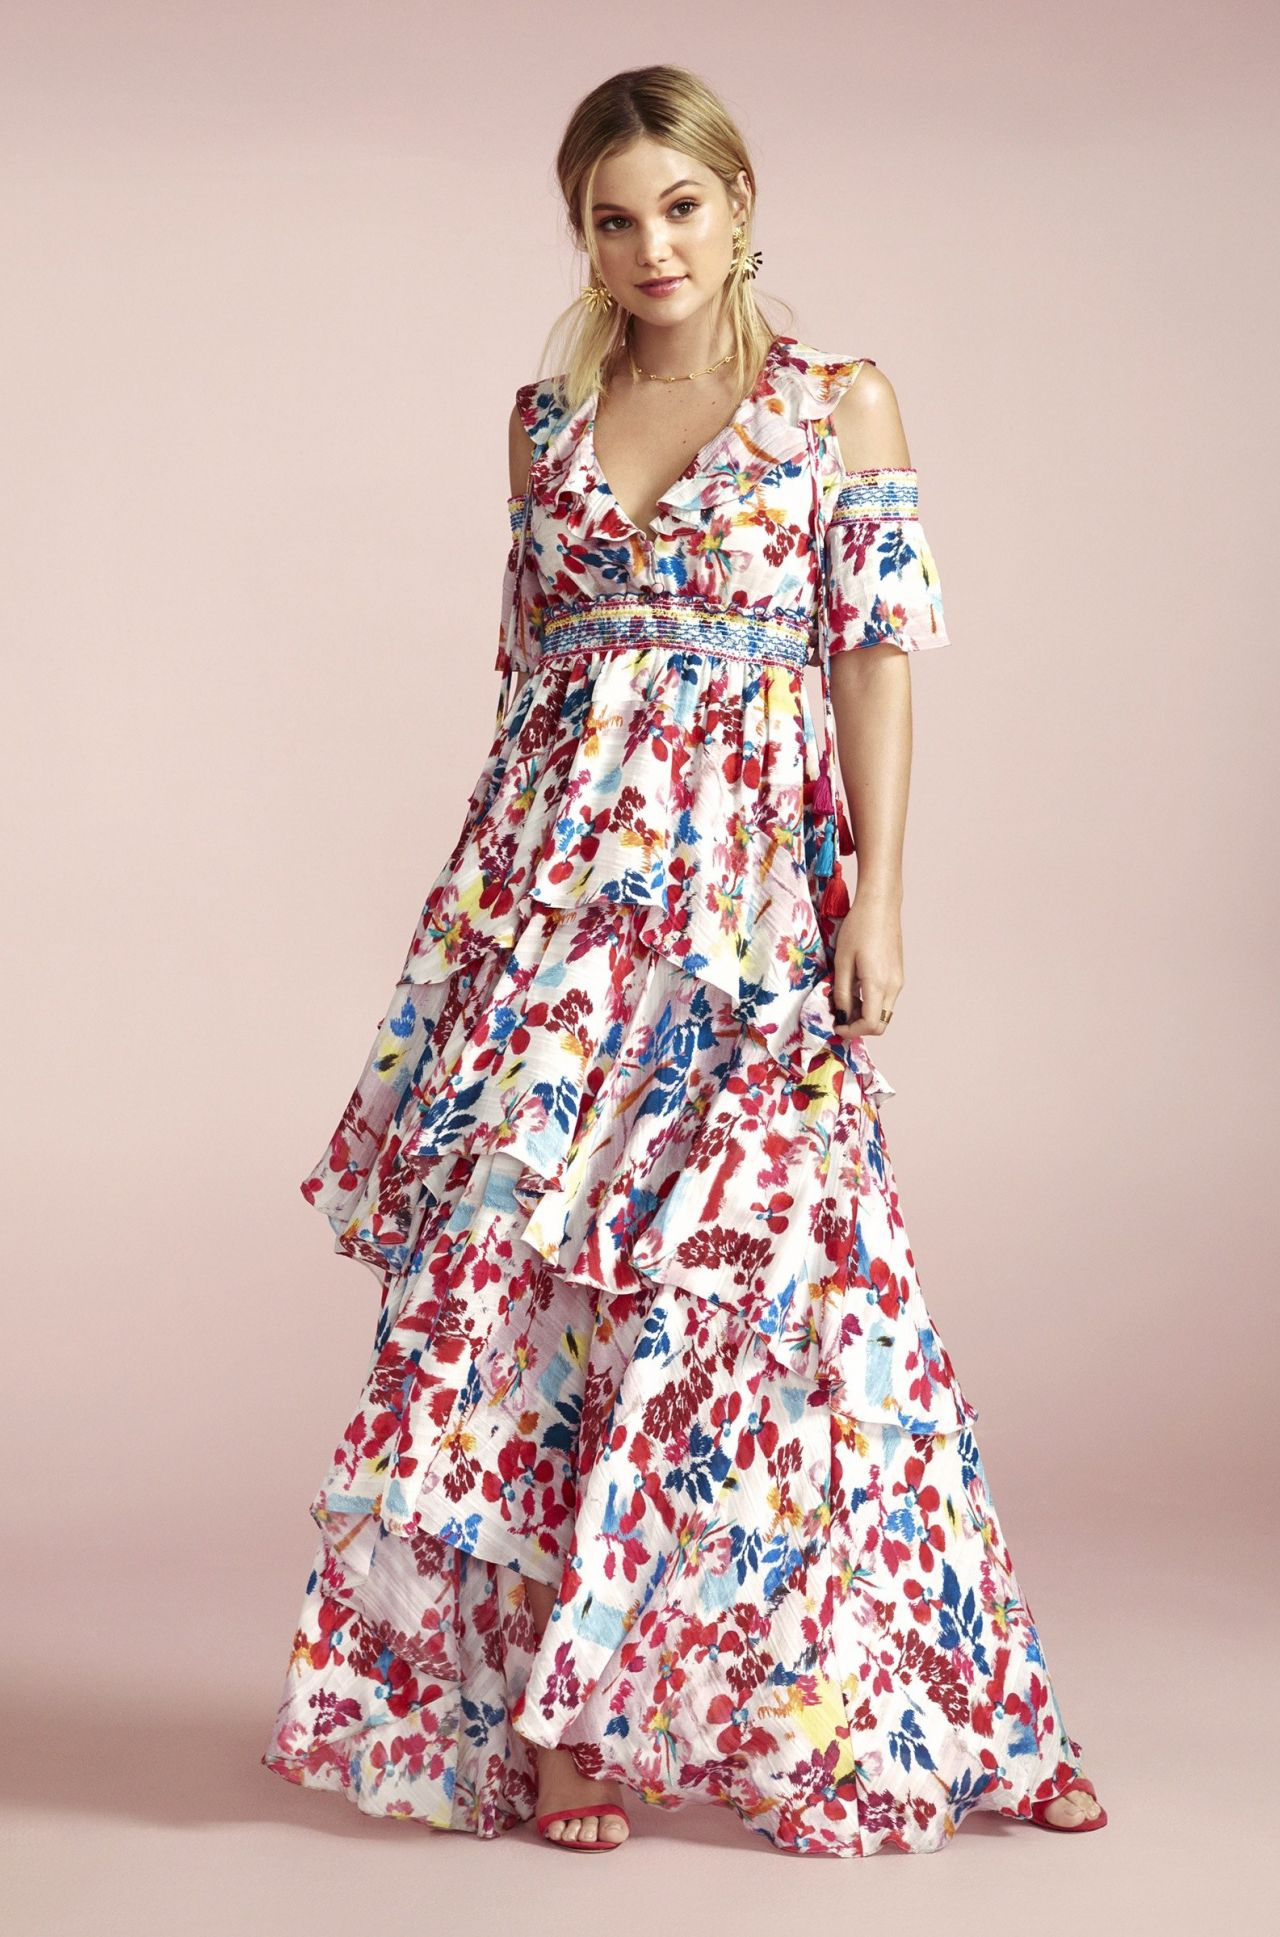 Globe Dress Lea Michele